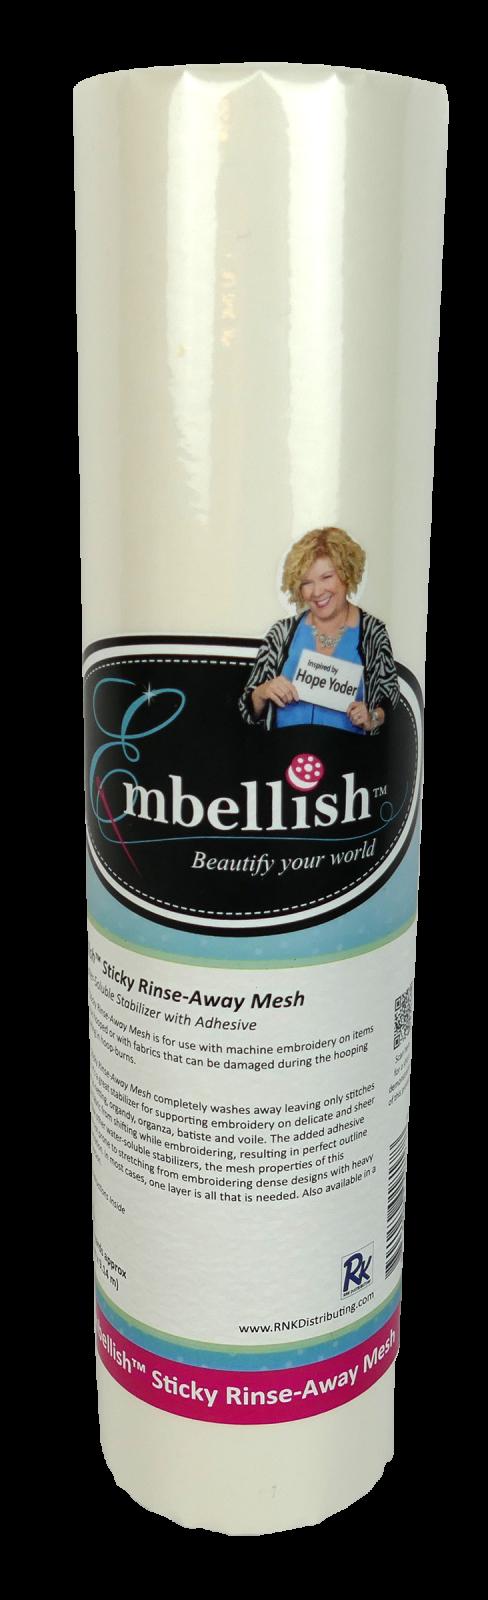 Sticky Rinse-Away Mesh - 12x10yds - Embellish